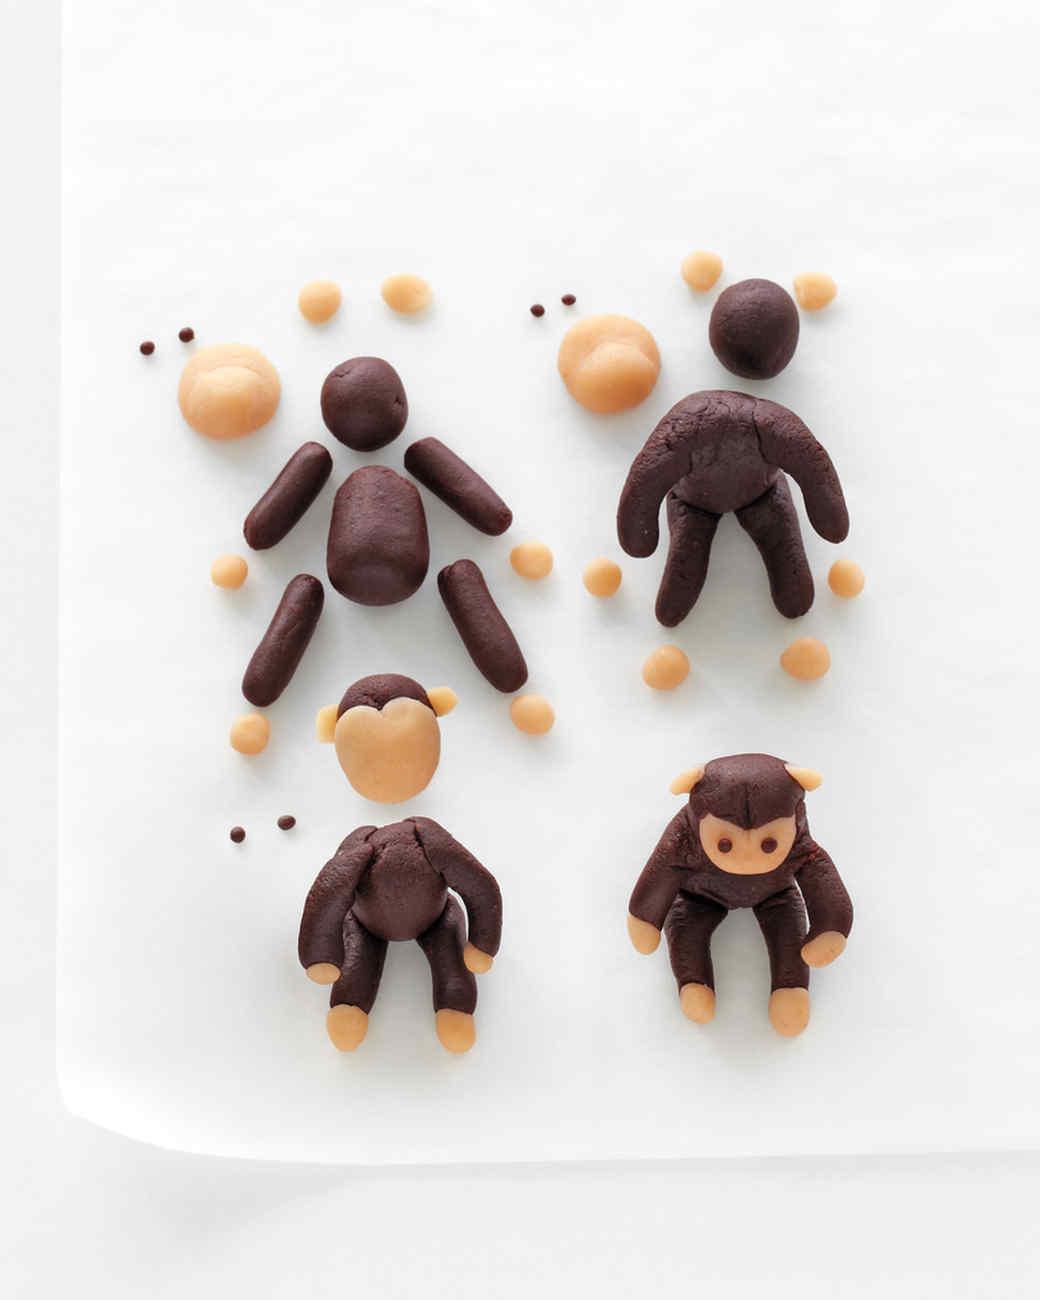 jude-perry-st-monkey-2-mld109137.jpg